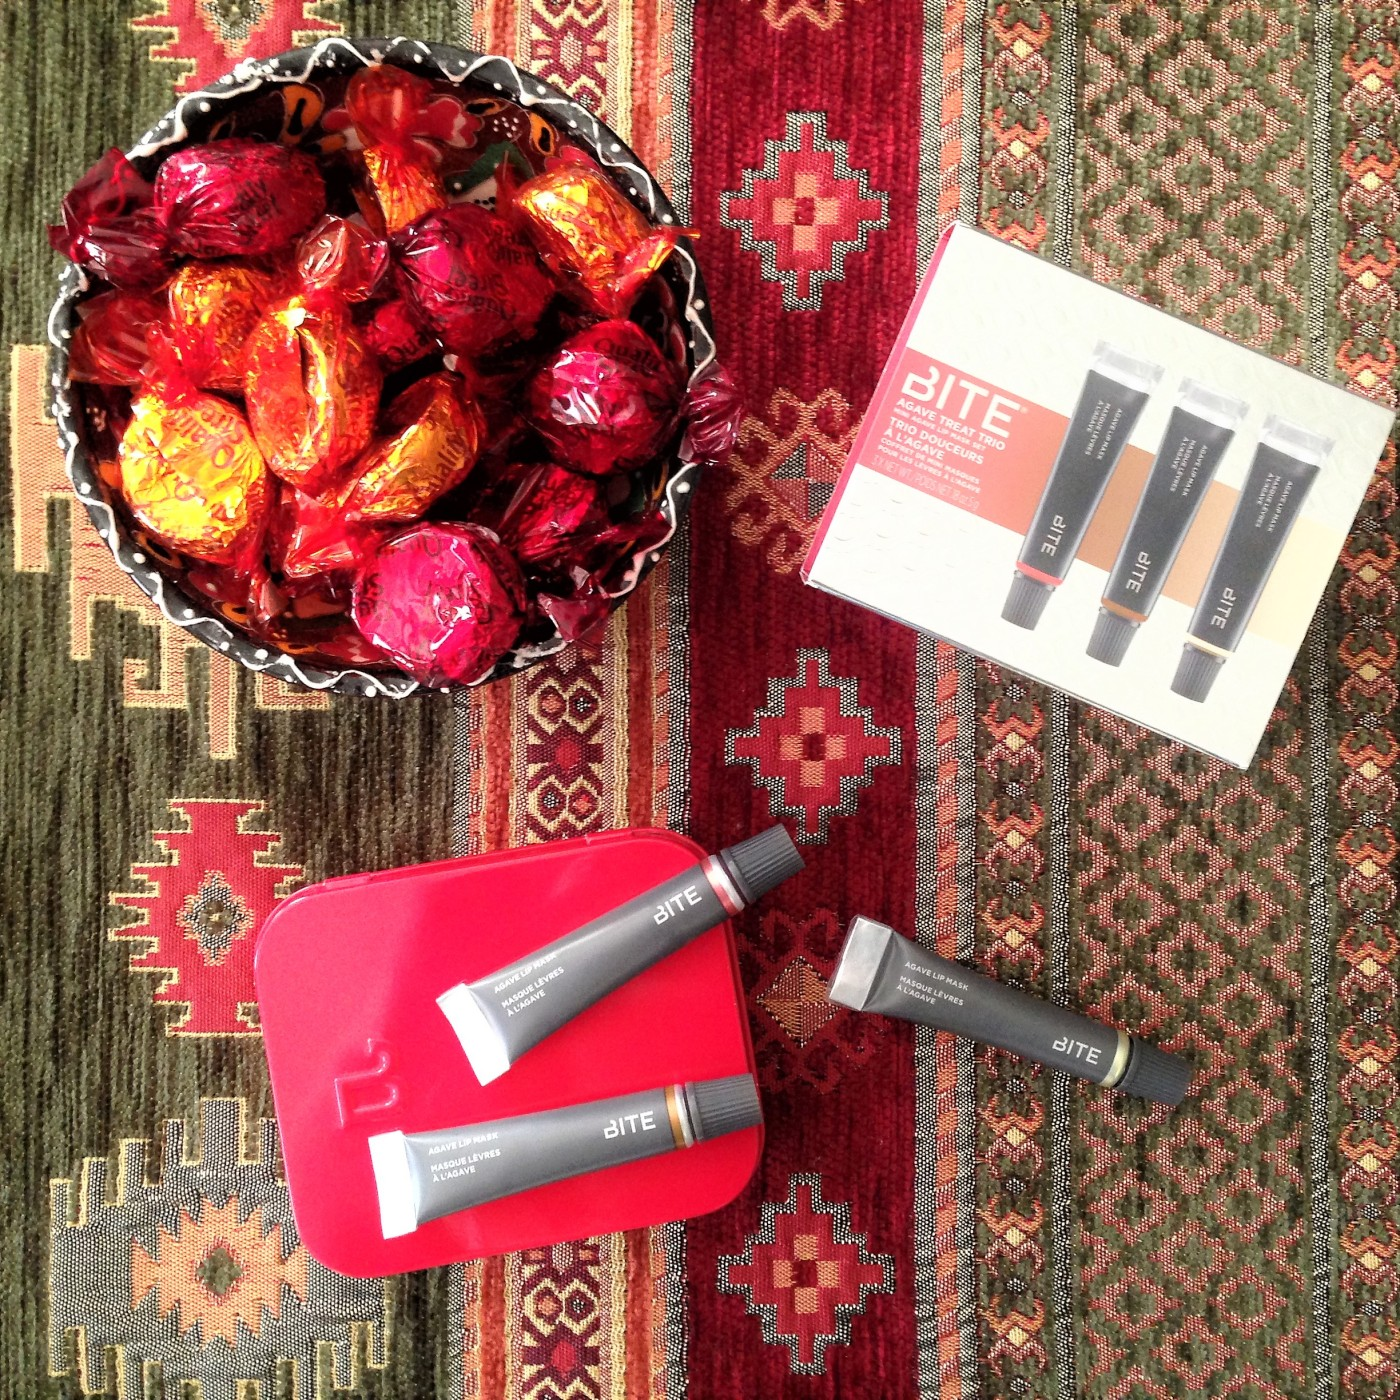 bite beauty agave lip mask set review